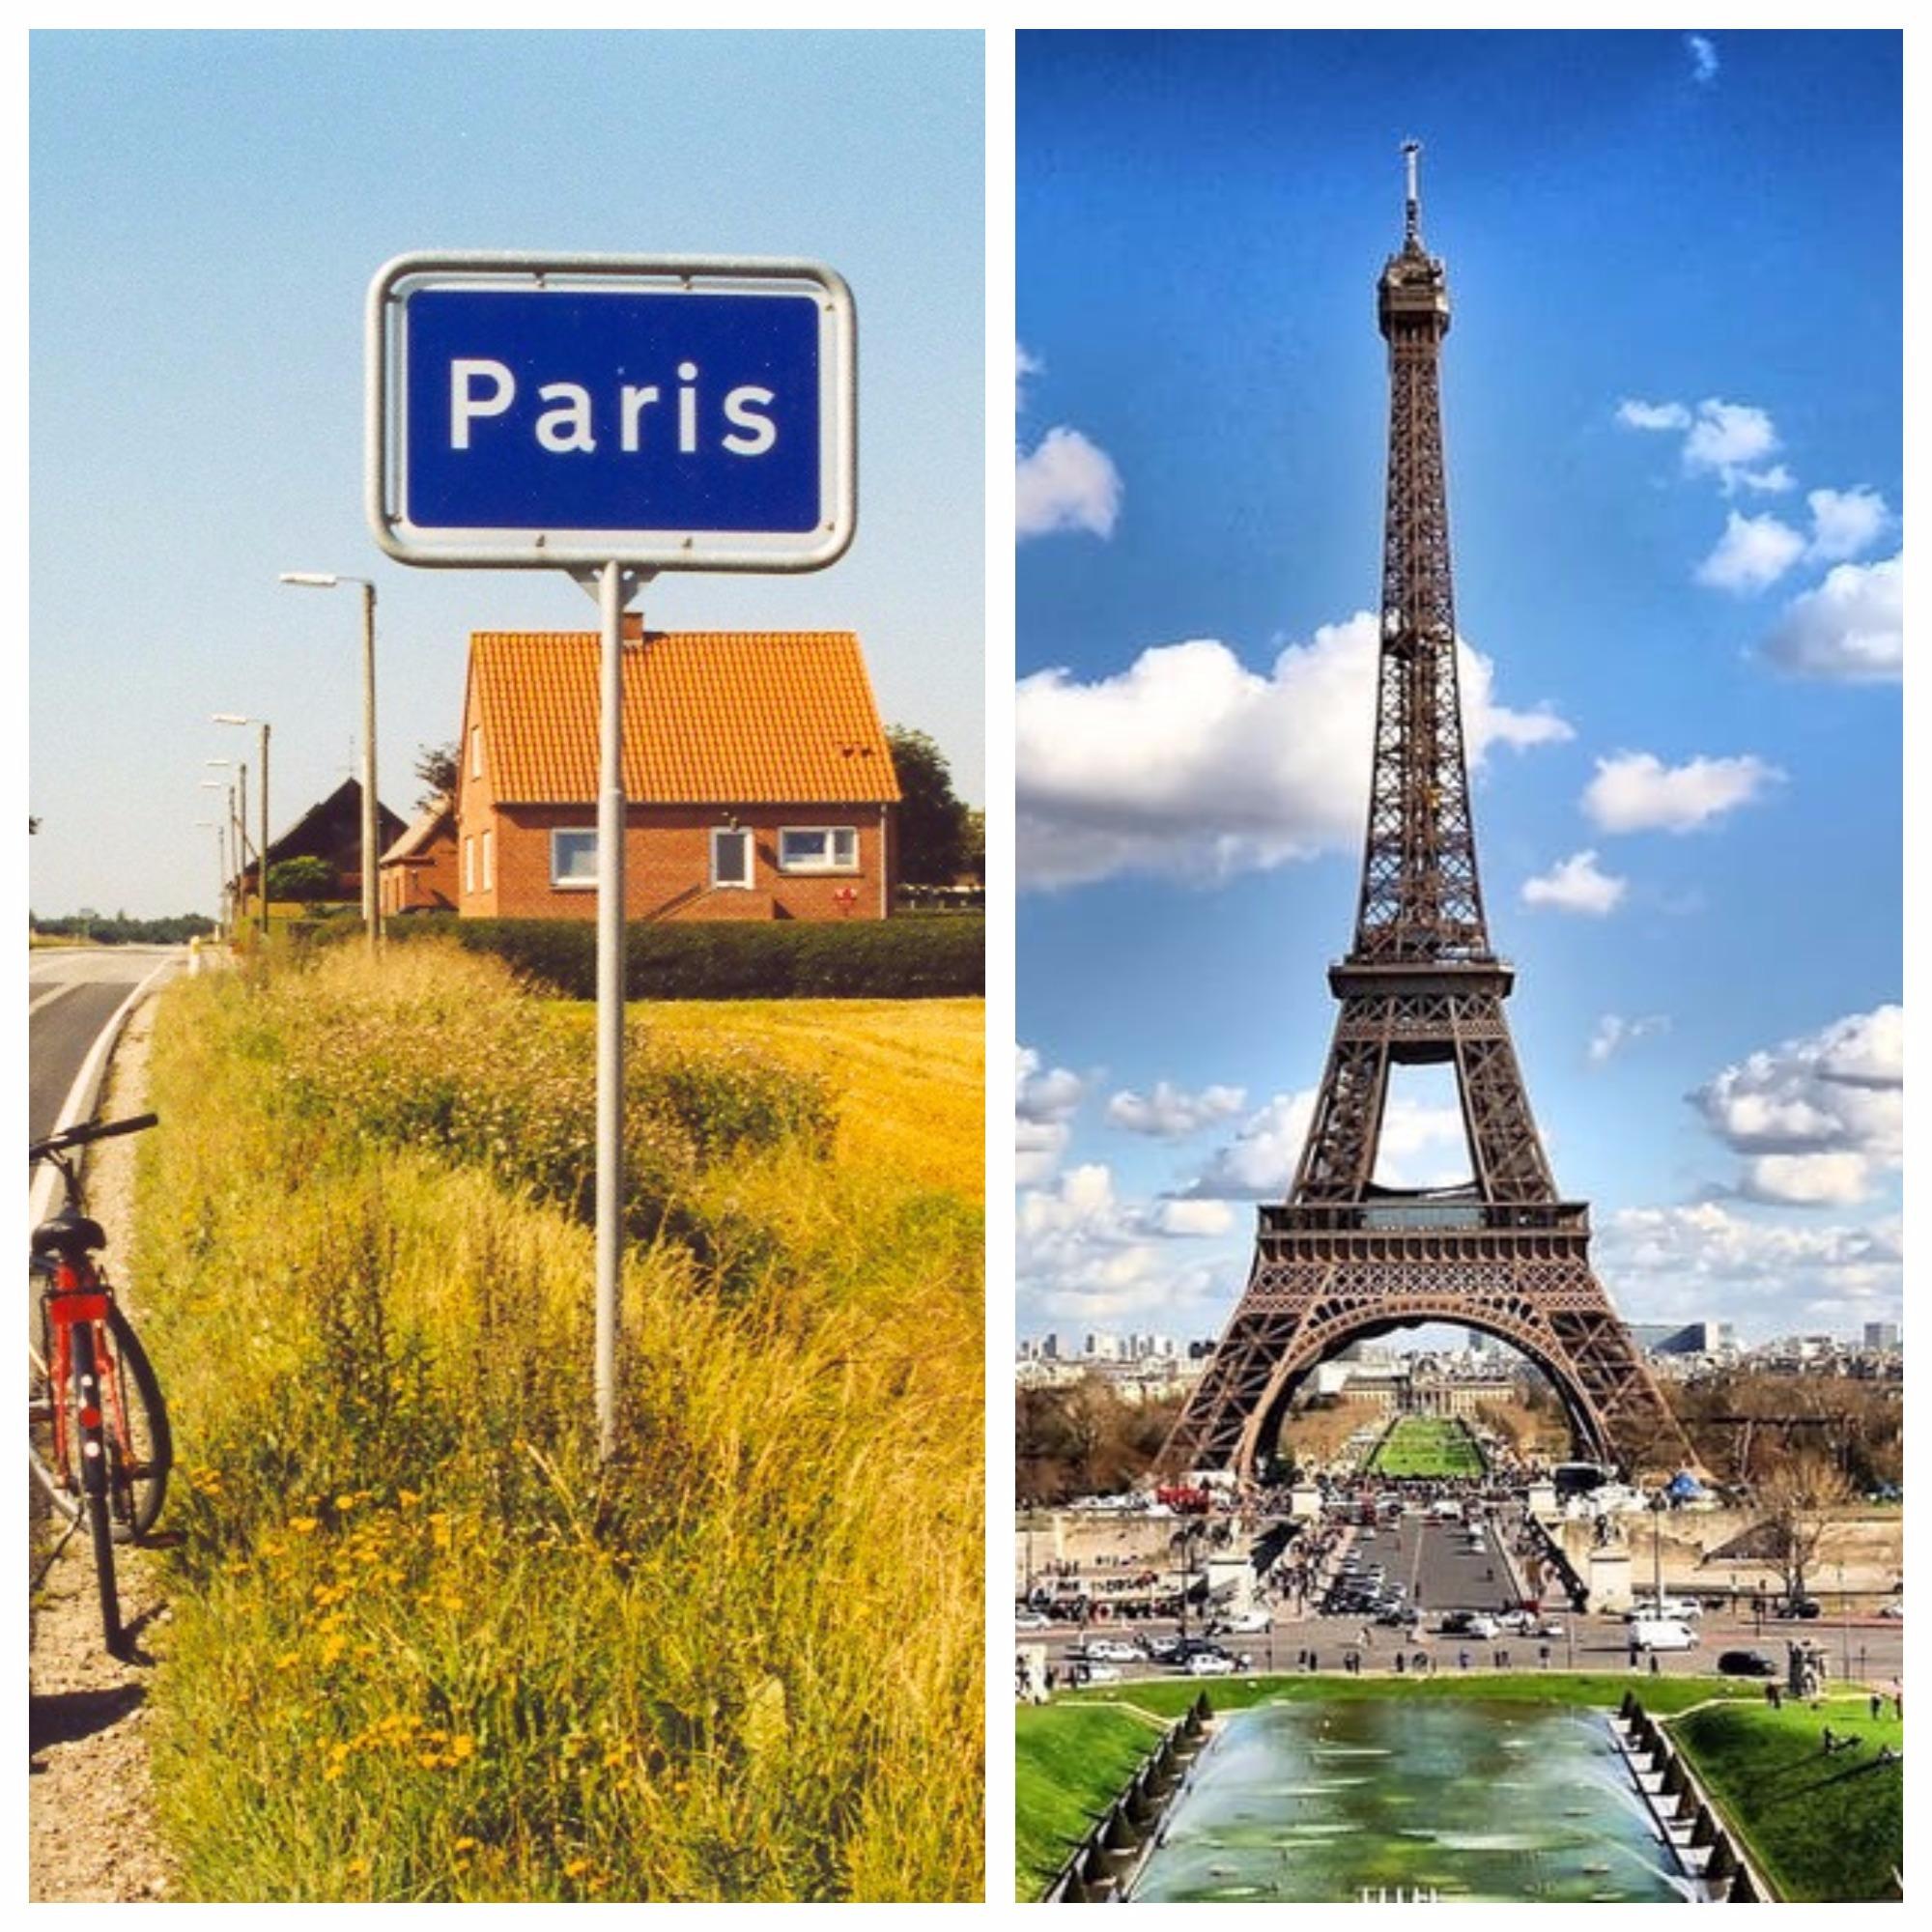 Paris around the world